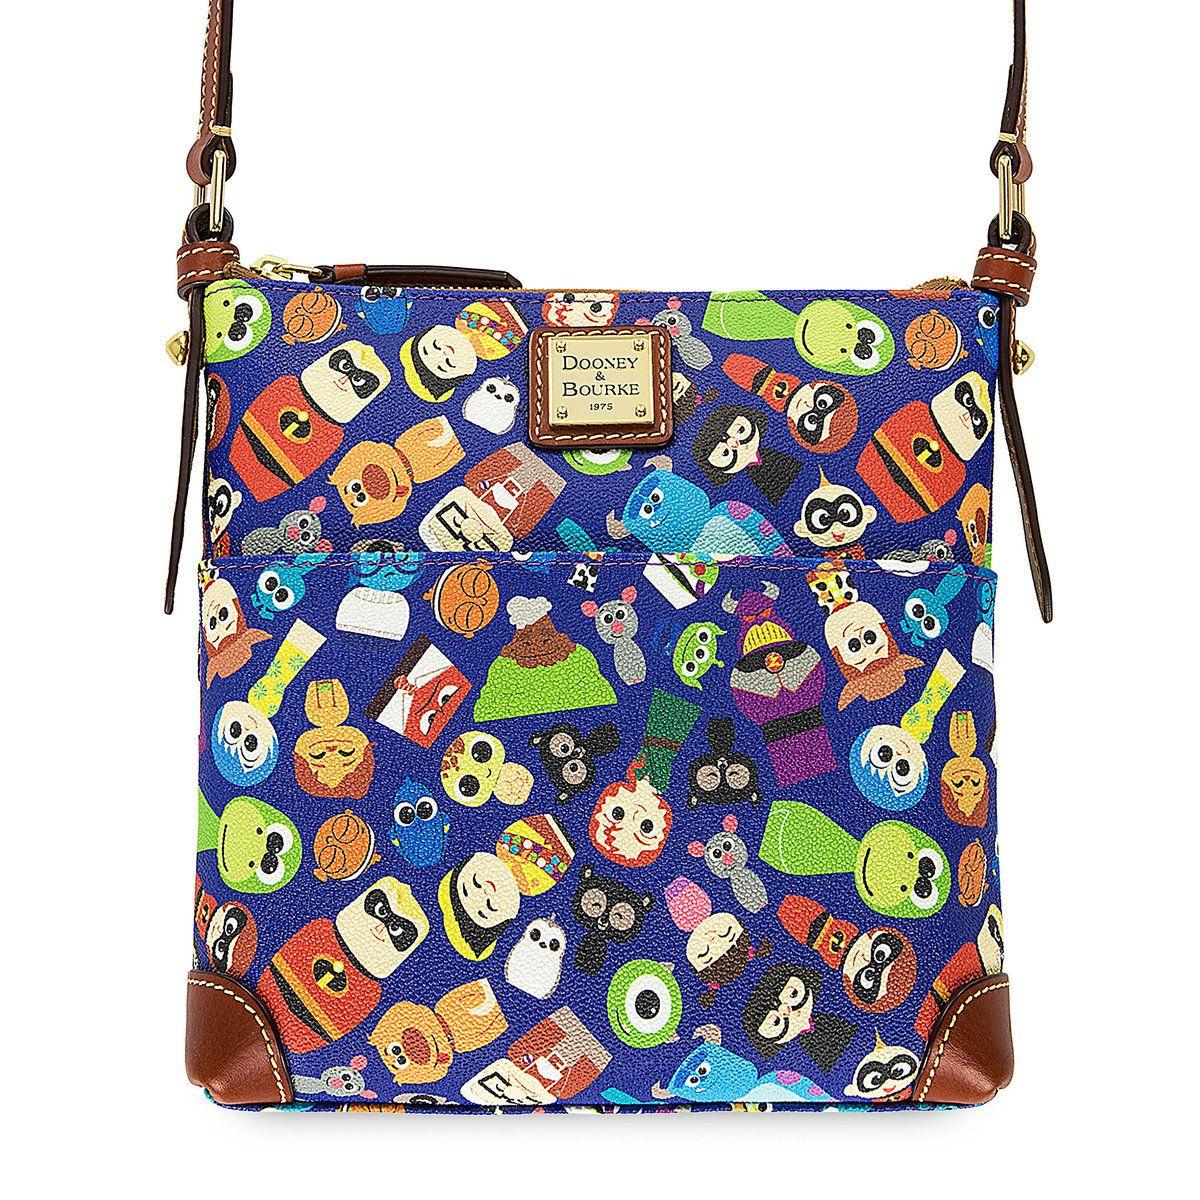 quality design 4145c 83899 Dooney   Bourke Pixar Purses